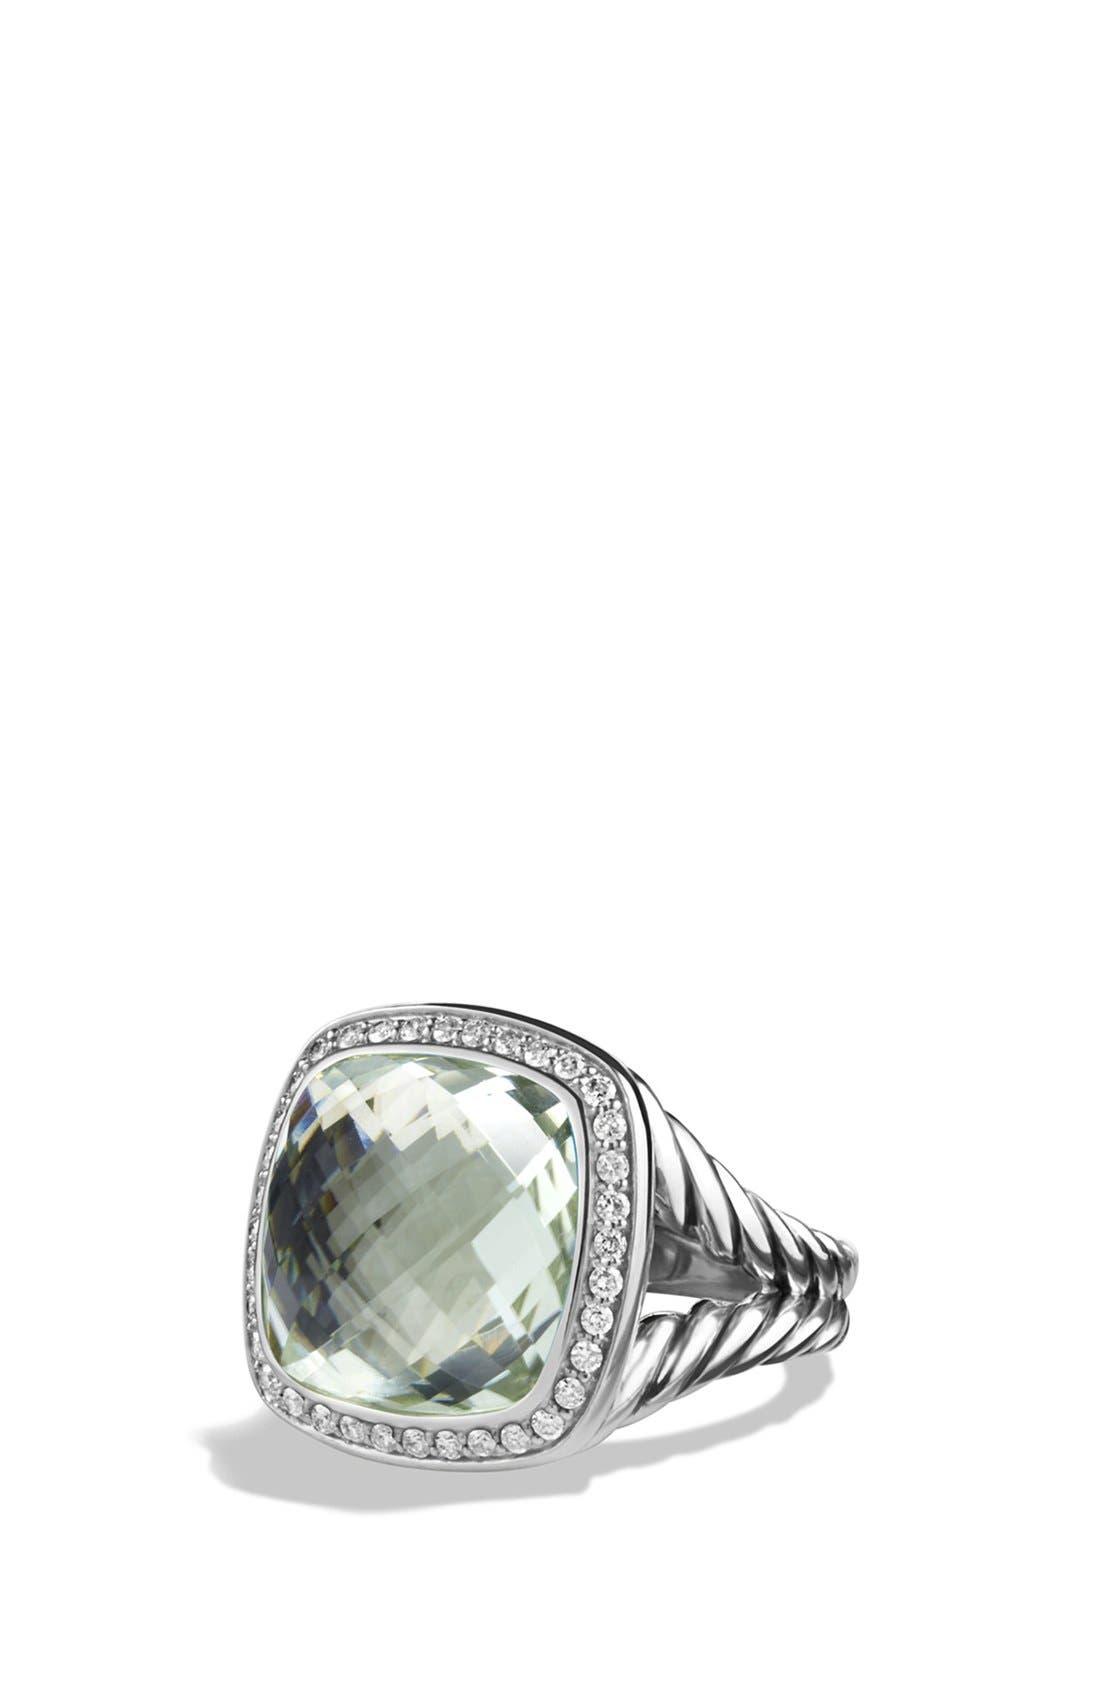 'Albion' Ring with Semiprecious Stone and Diamonds,                             Main thumbnail 1, color,                             PRASIOLITE